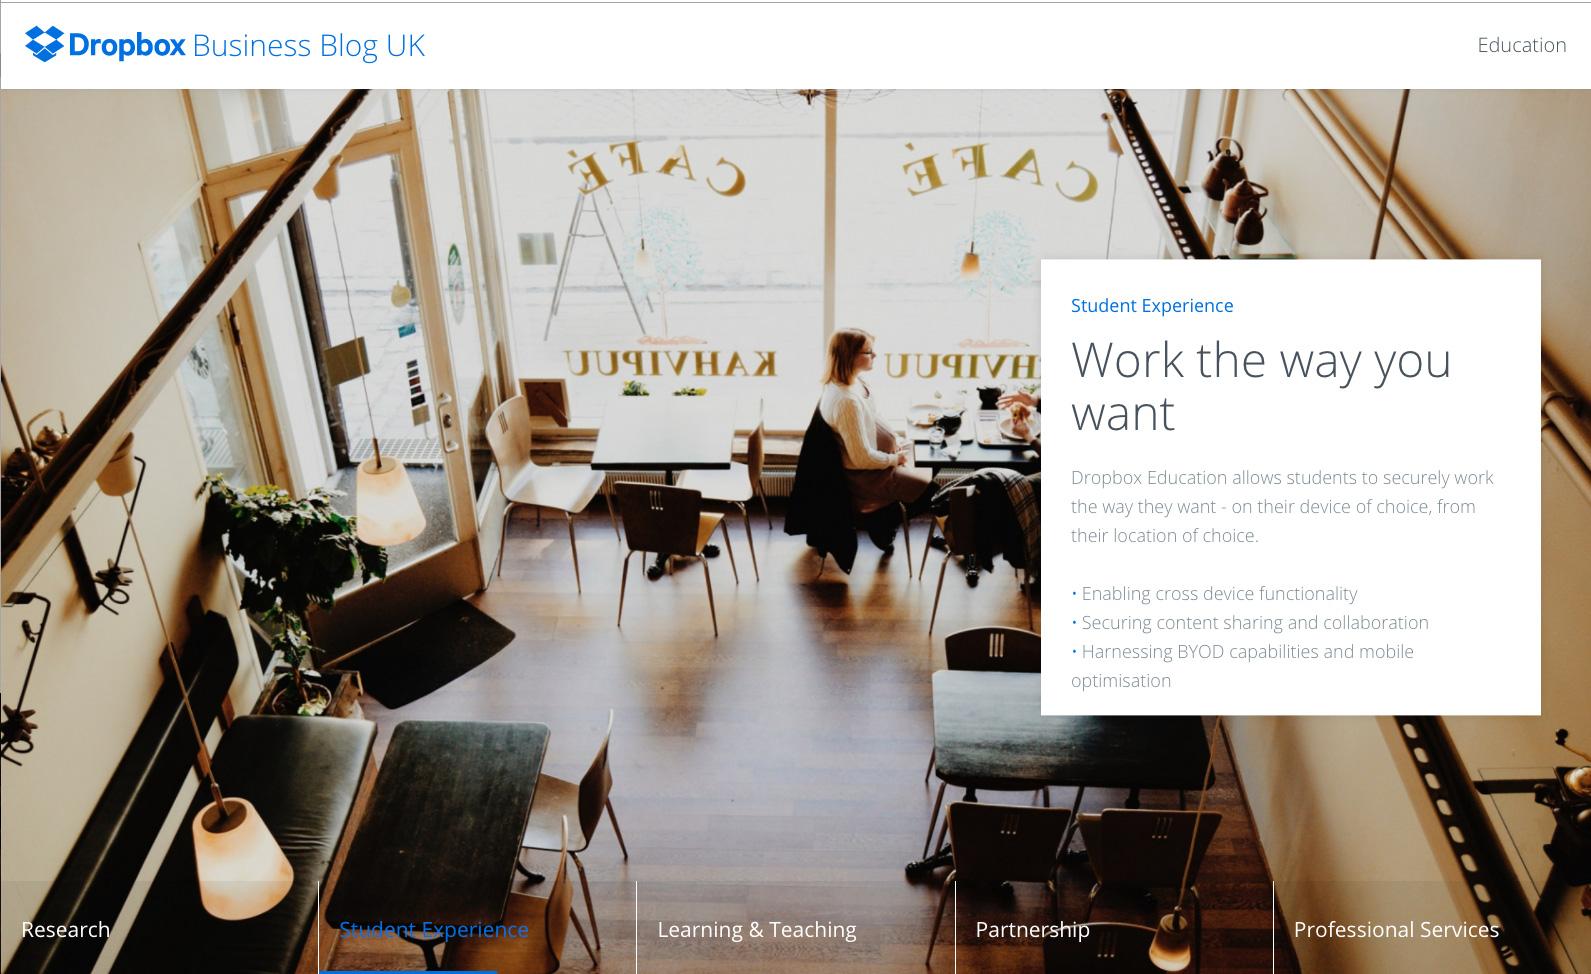 Dropbox Business Blog